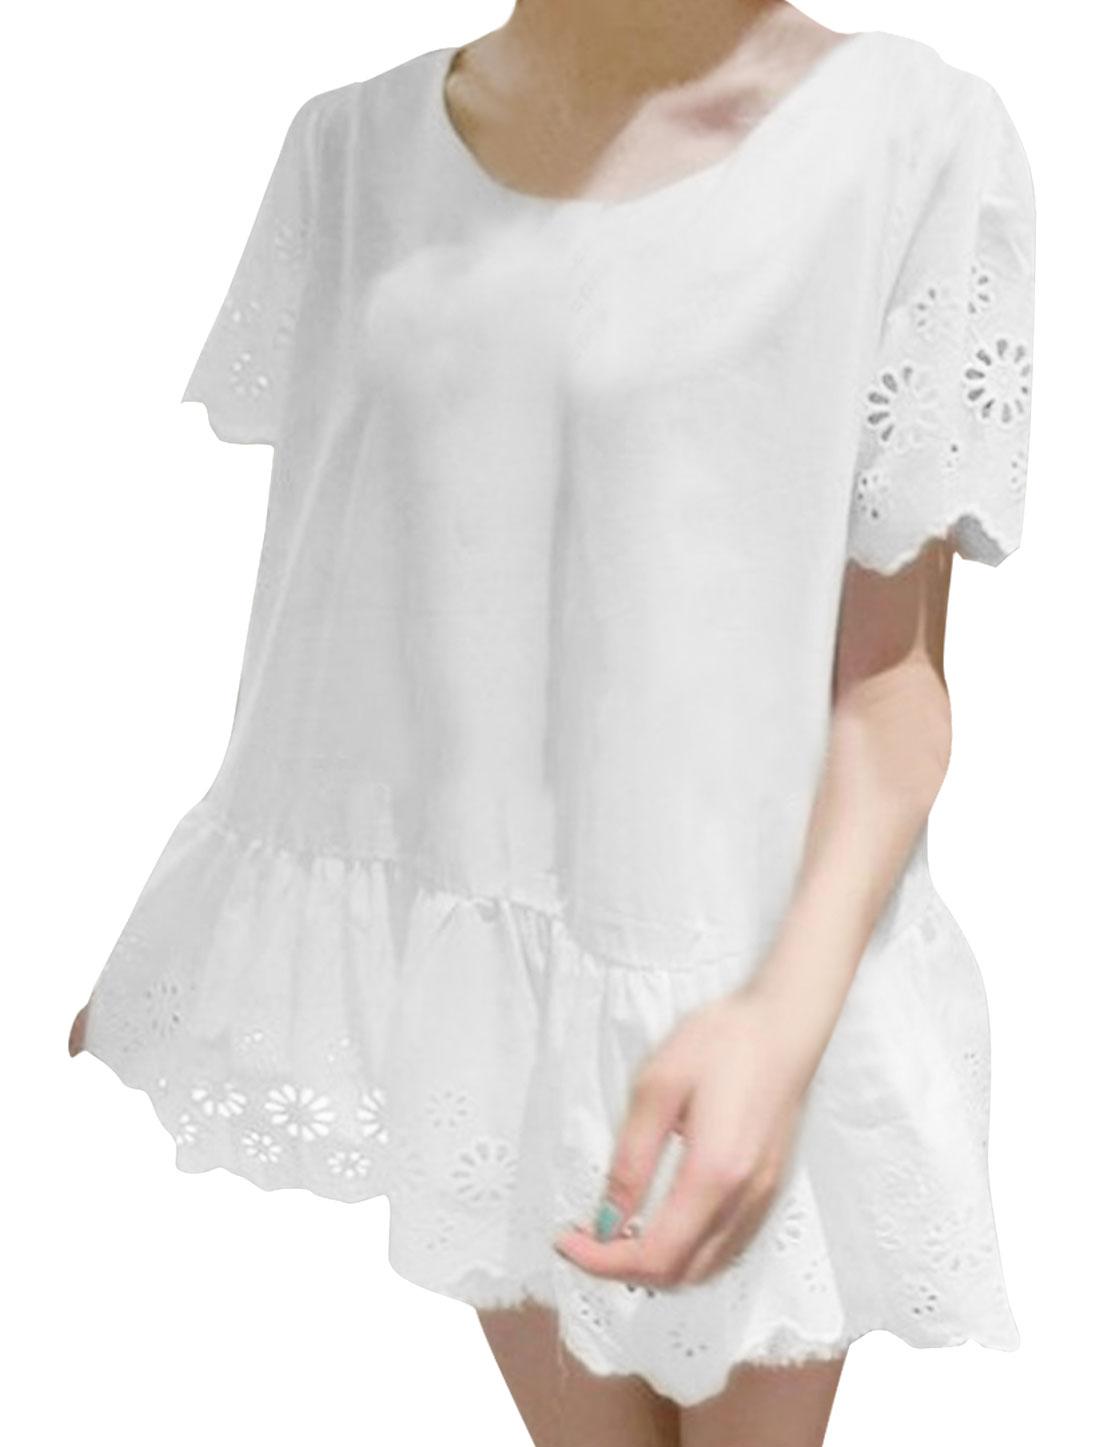 Lady White Round Neck Short Sleeve Flouncing Hem Top S